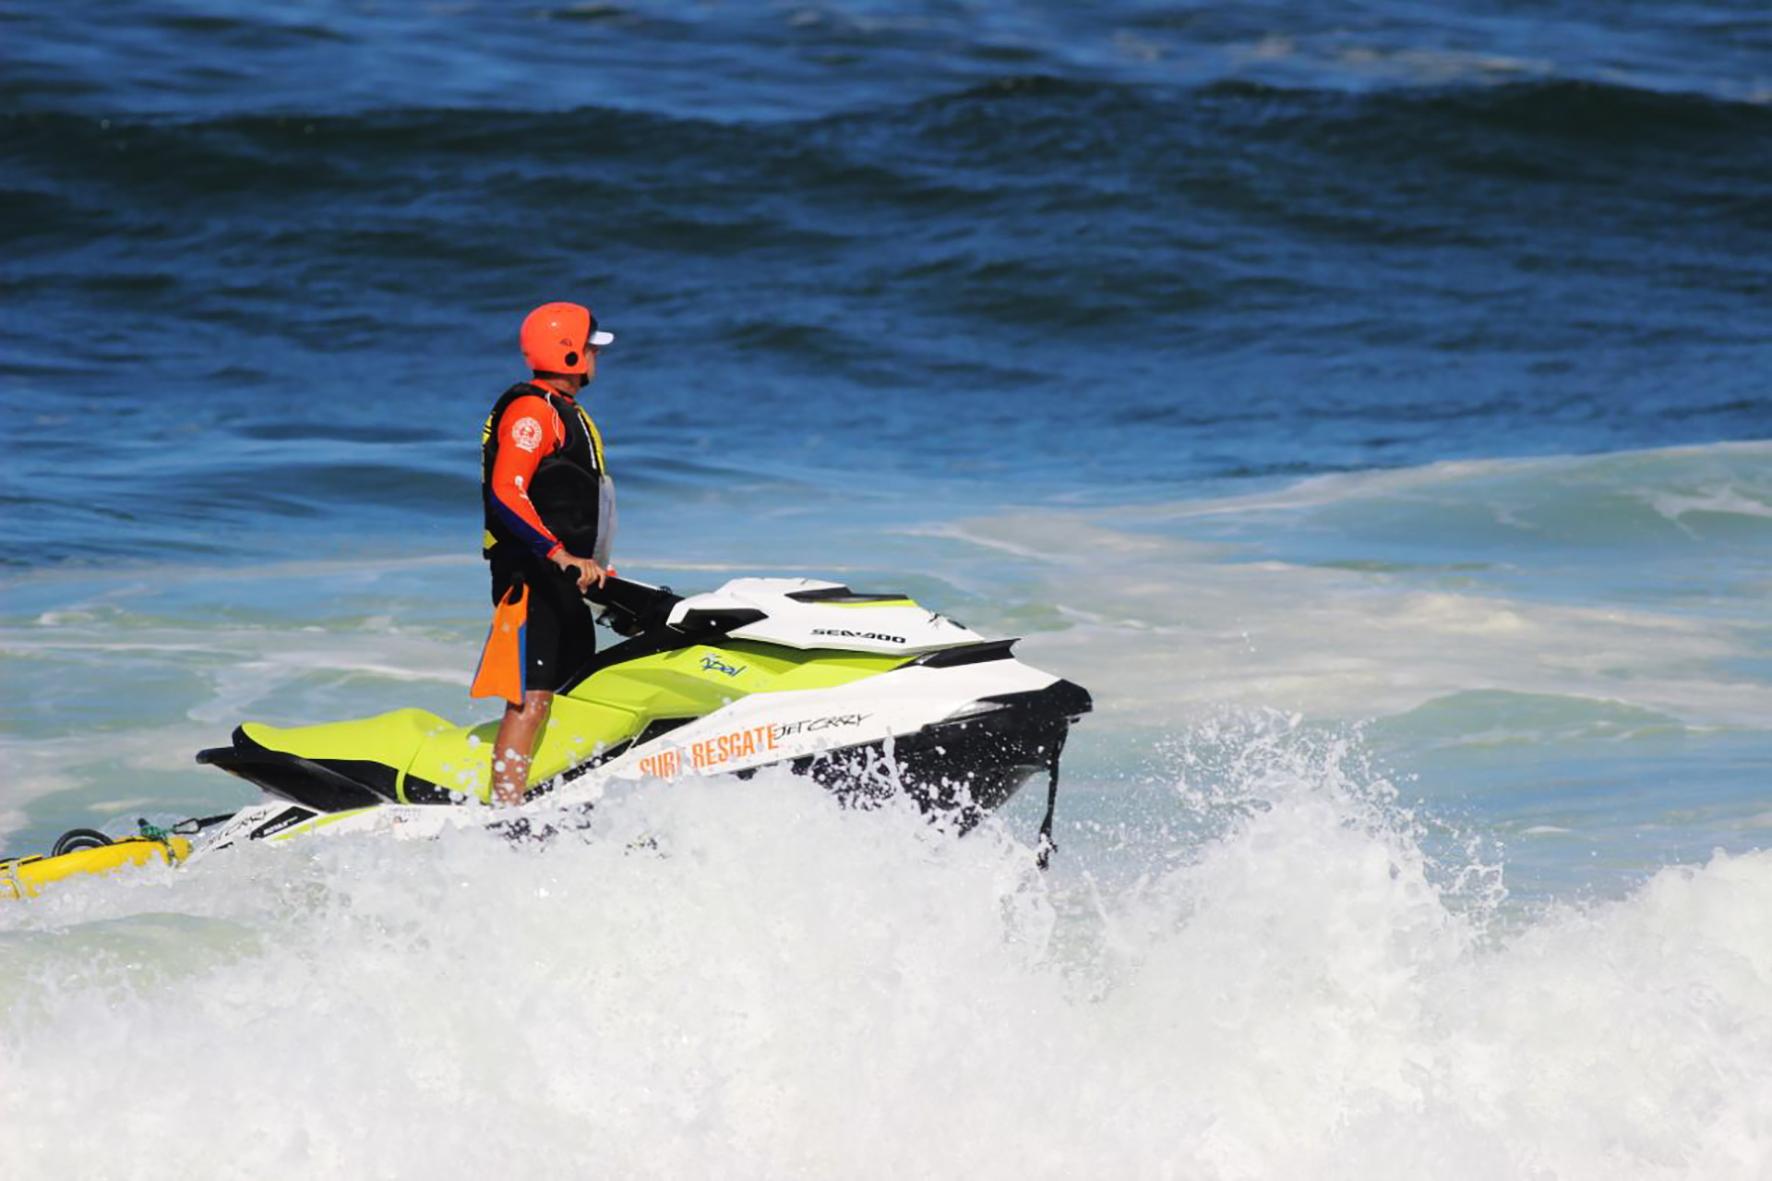 Surf Resgate atua nos bastidores da etapa brasileira do Campeonato Mundial